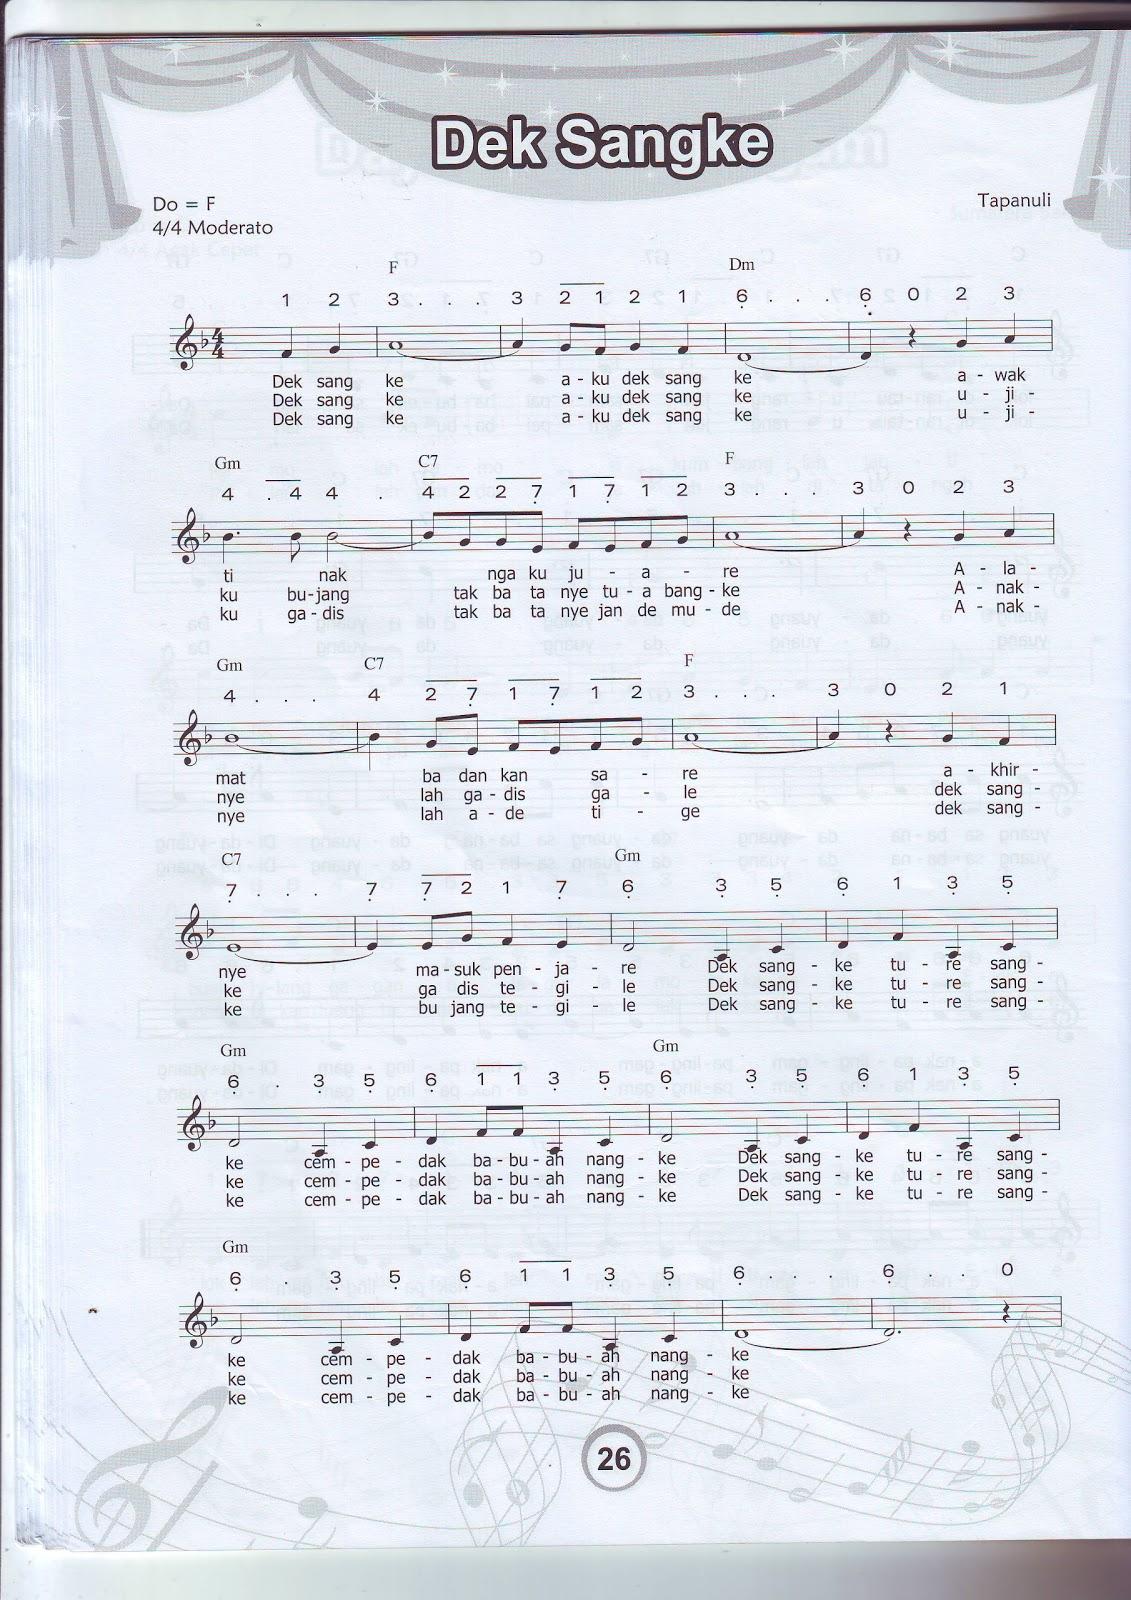 Lirik Lagu Daerah Ampar Ampar Pisang | newhairstylesformen2014.com